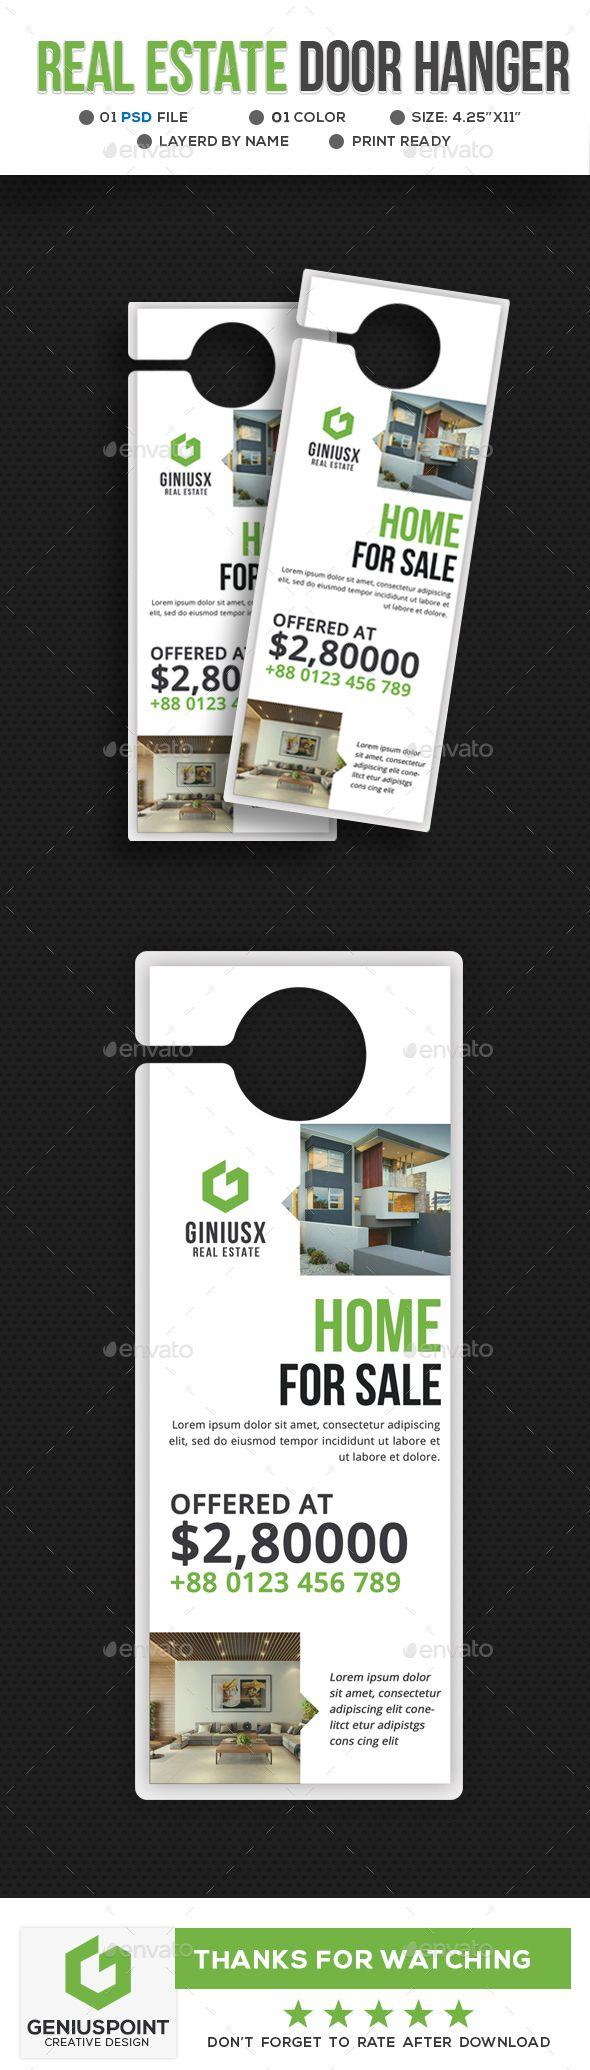 Real Estate Door Hanger | Pinterest | Print templates, Template and ...